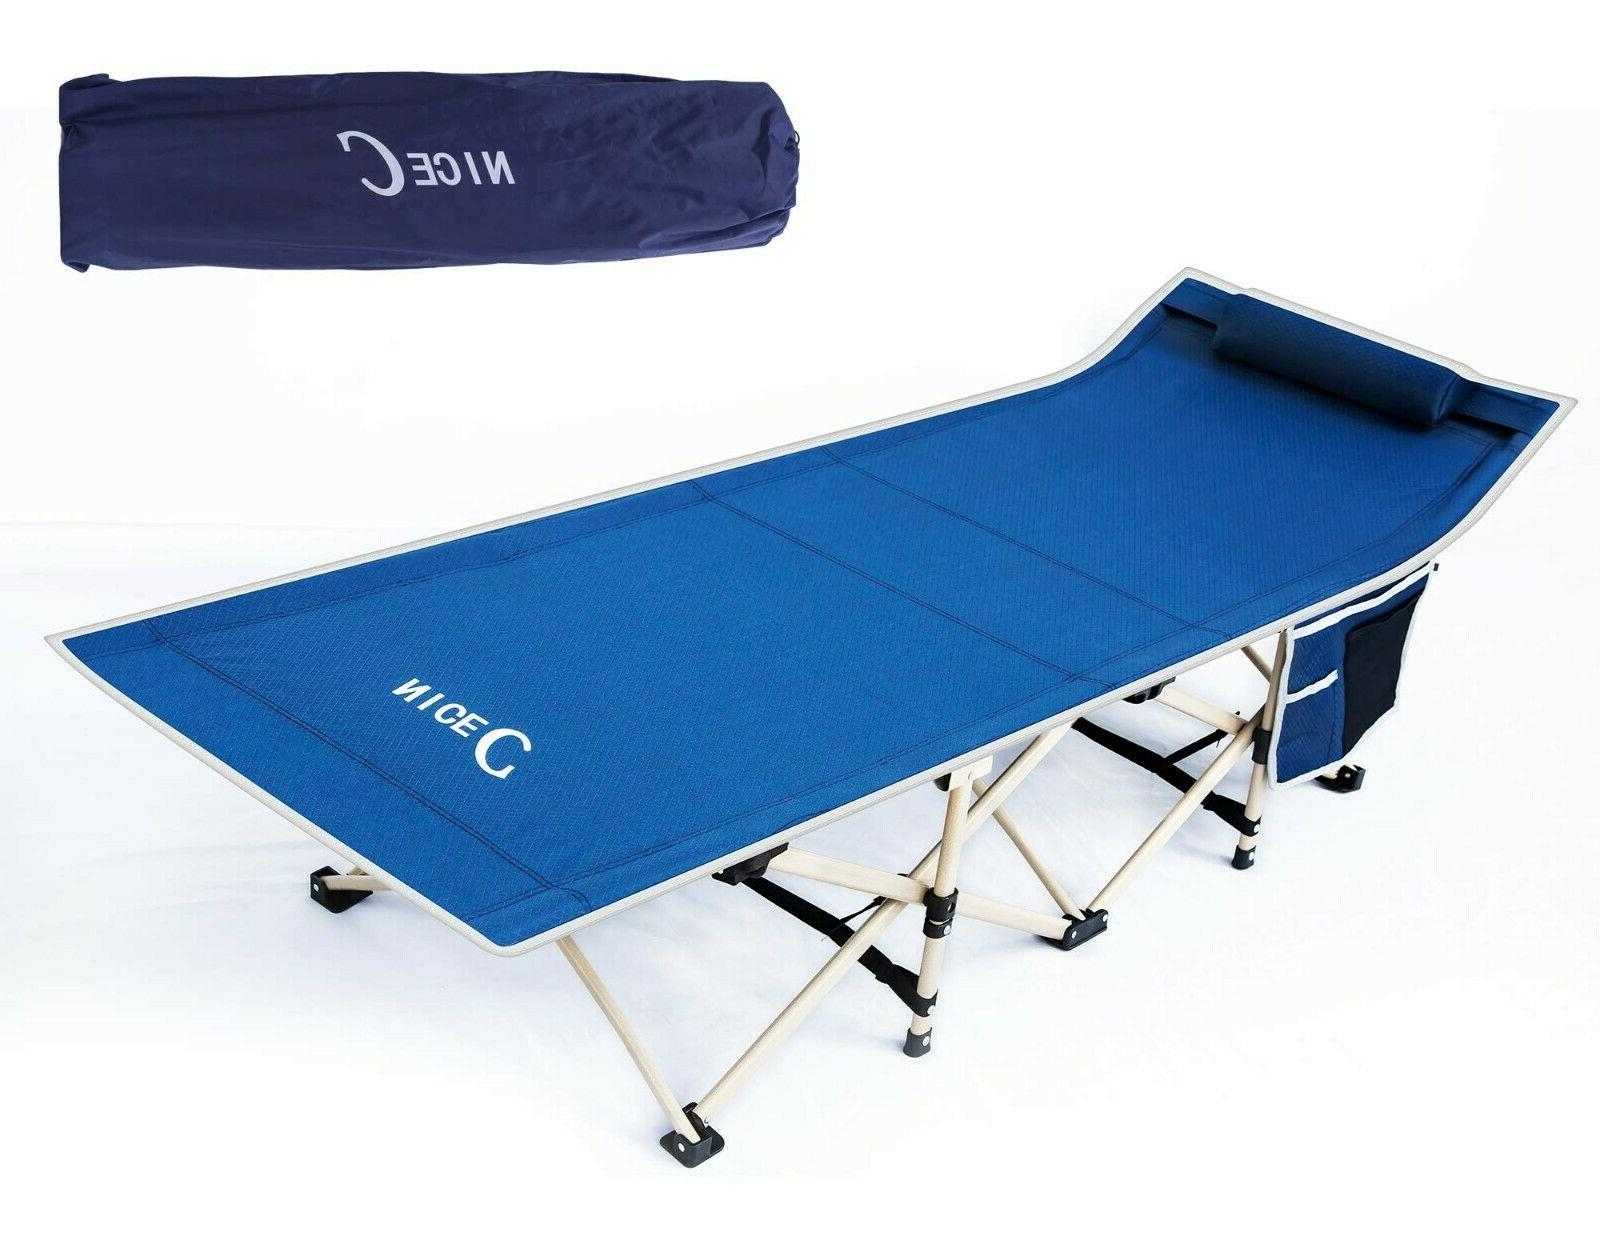 Folding Camping Portable Military Cot Sleeping Hiking Travel